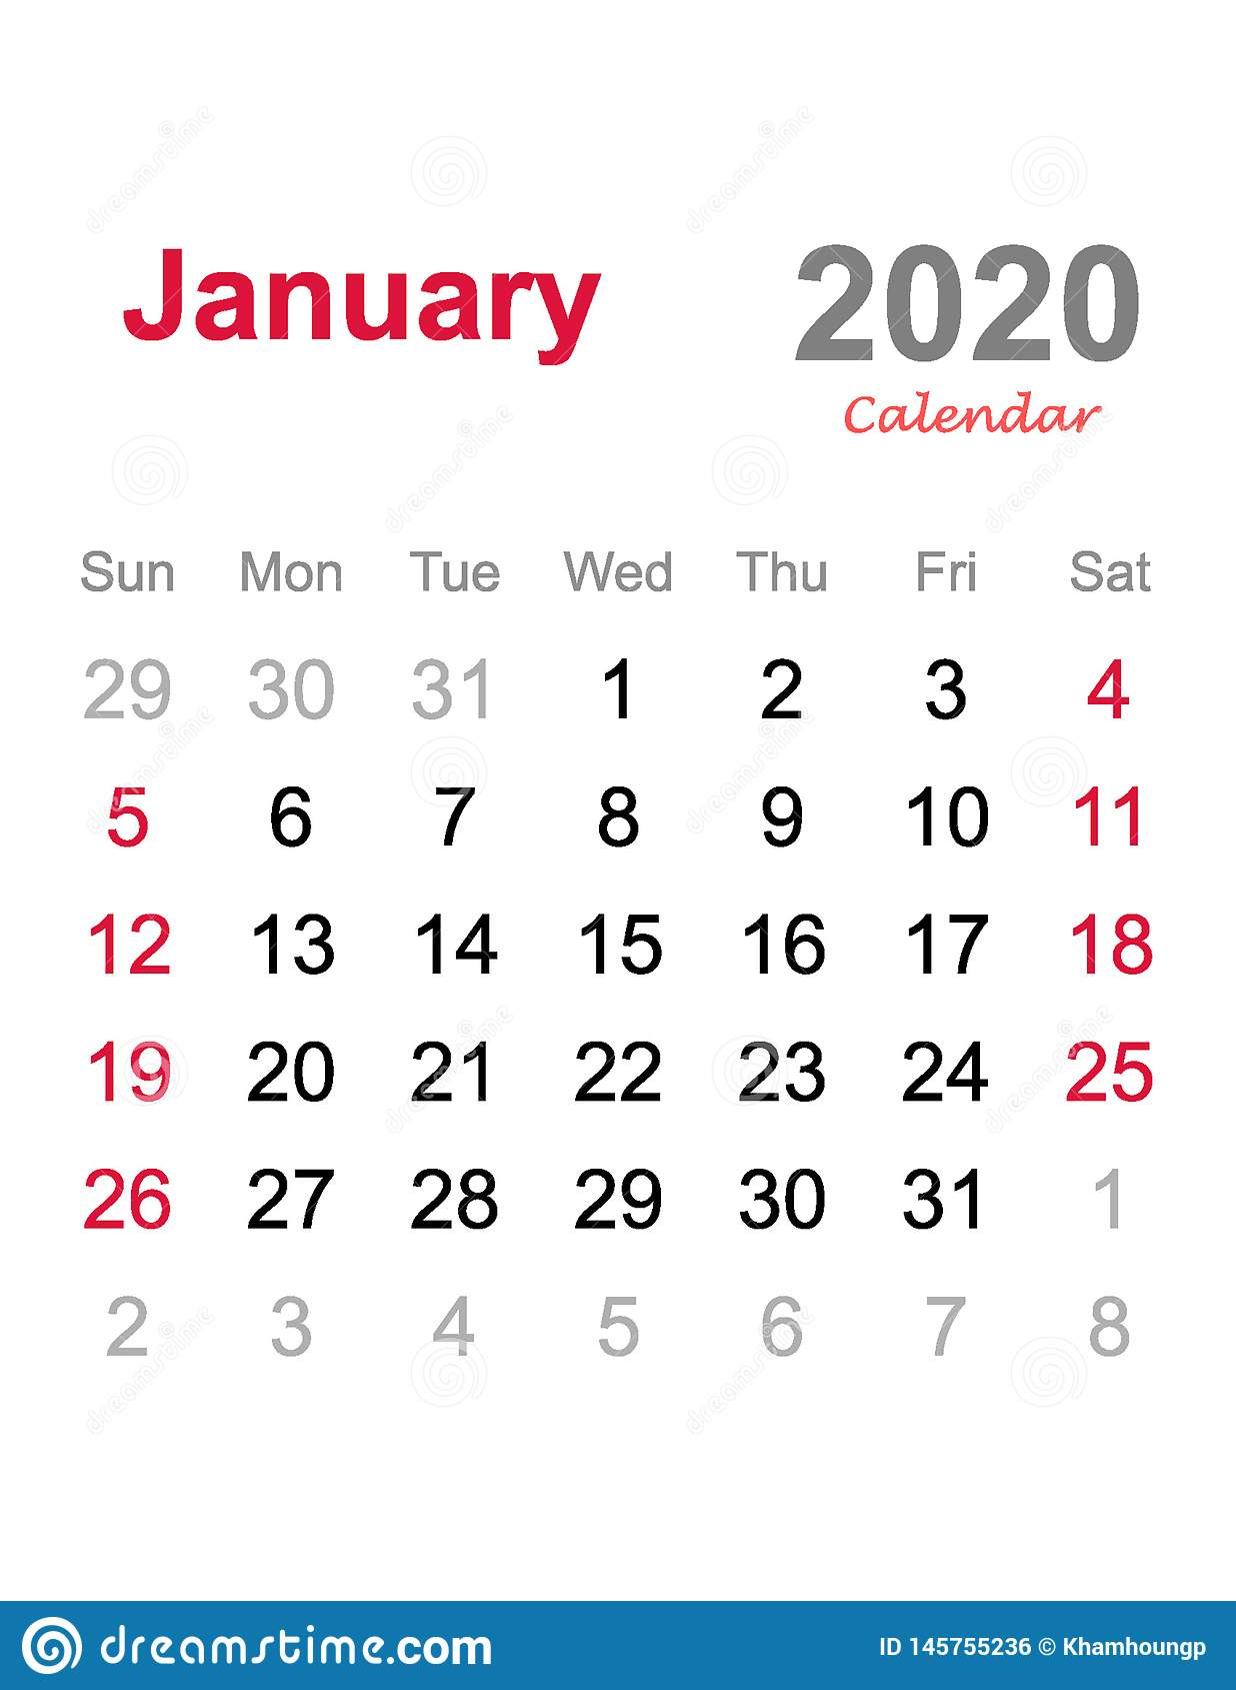 Calendrier 2020 Vectoriel Gratuit.Janvier 2020 Calendrier Calibre Mensuel De Calendrier